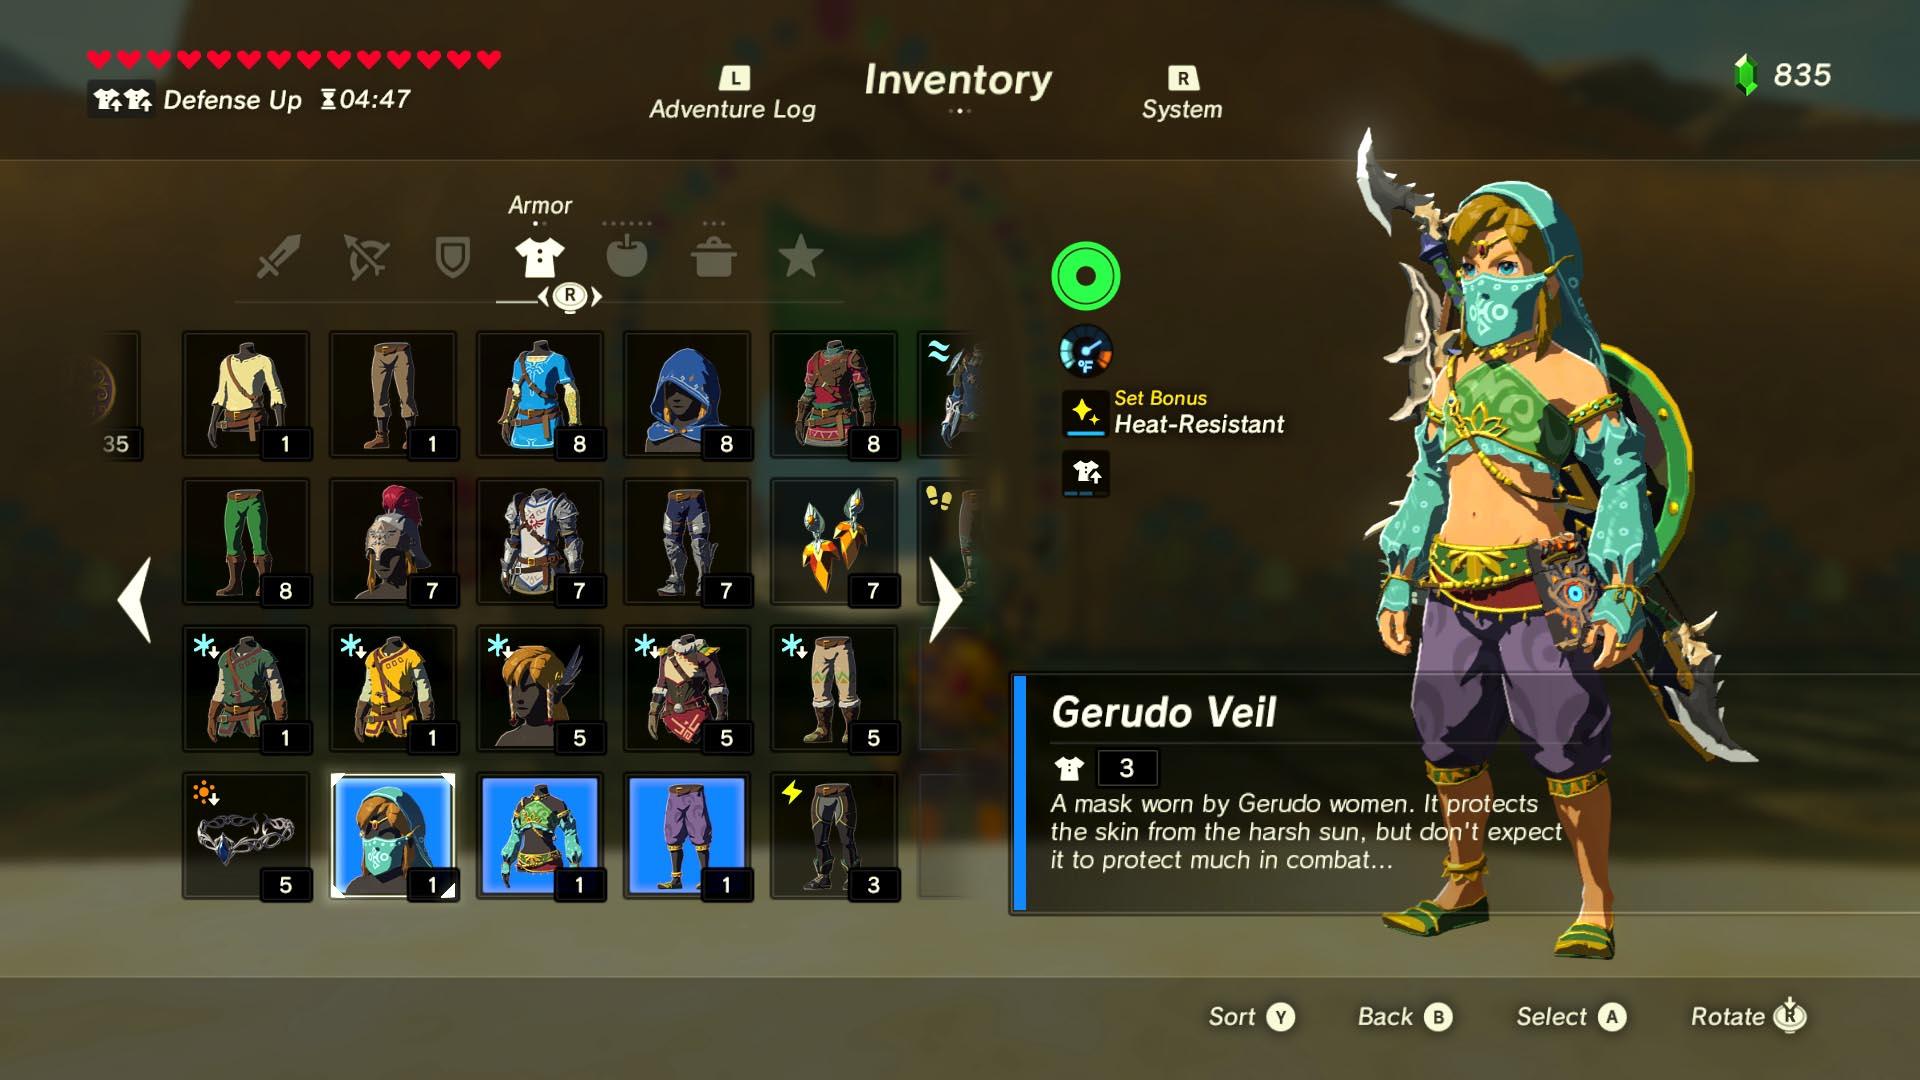 The Legend Of Zelda Breath Wild Divine Beast Vah Naboris Video This Walks You Through Building Circuit Using Grid View